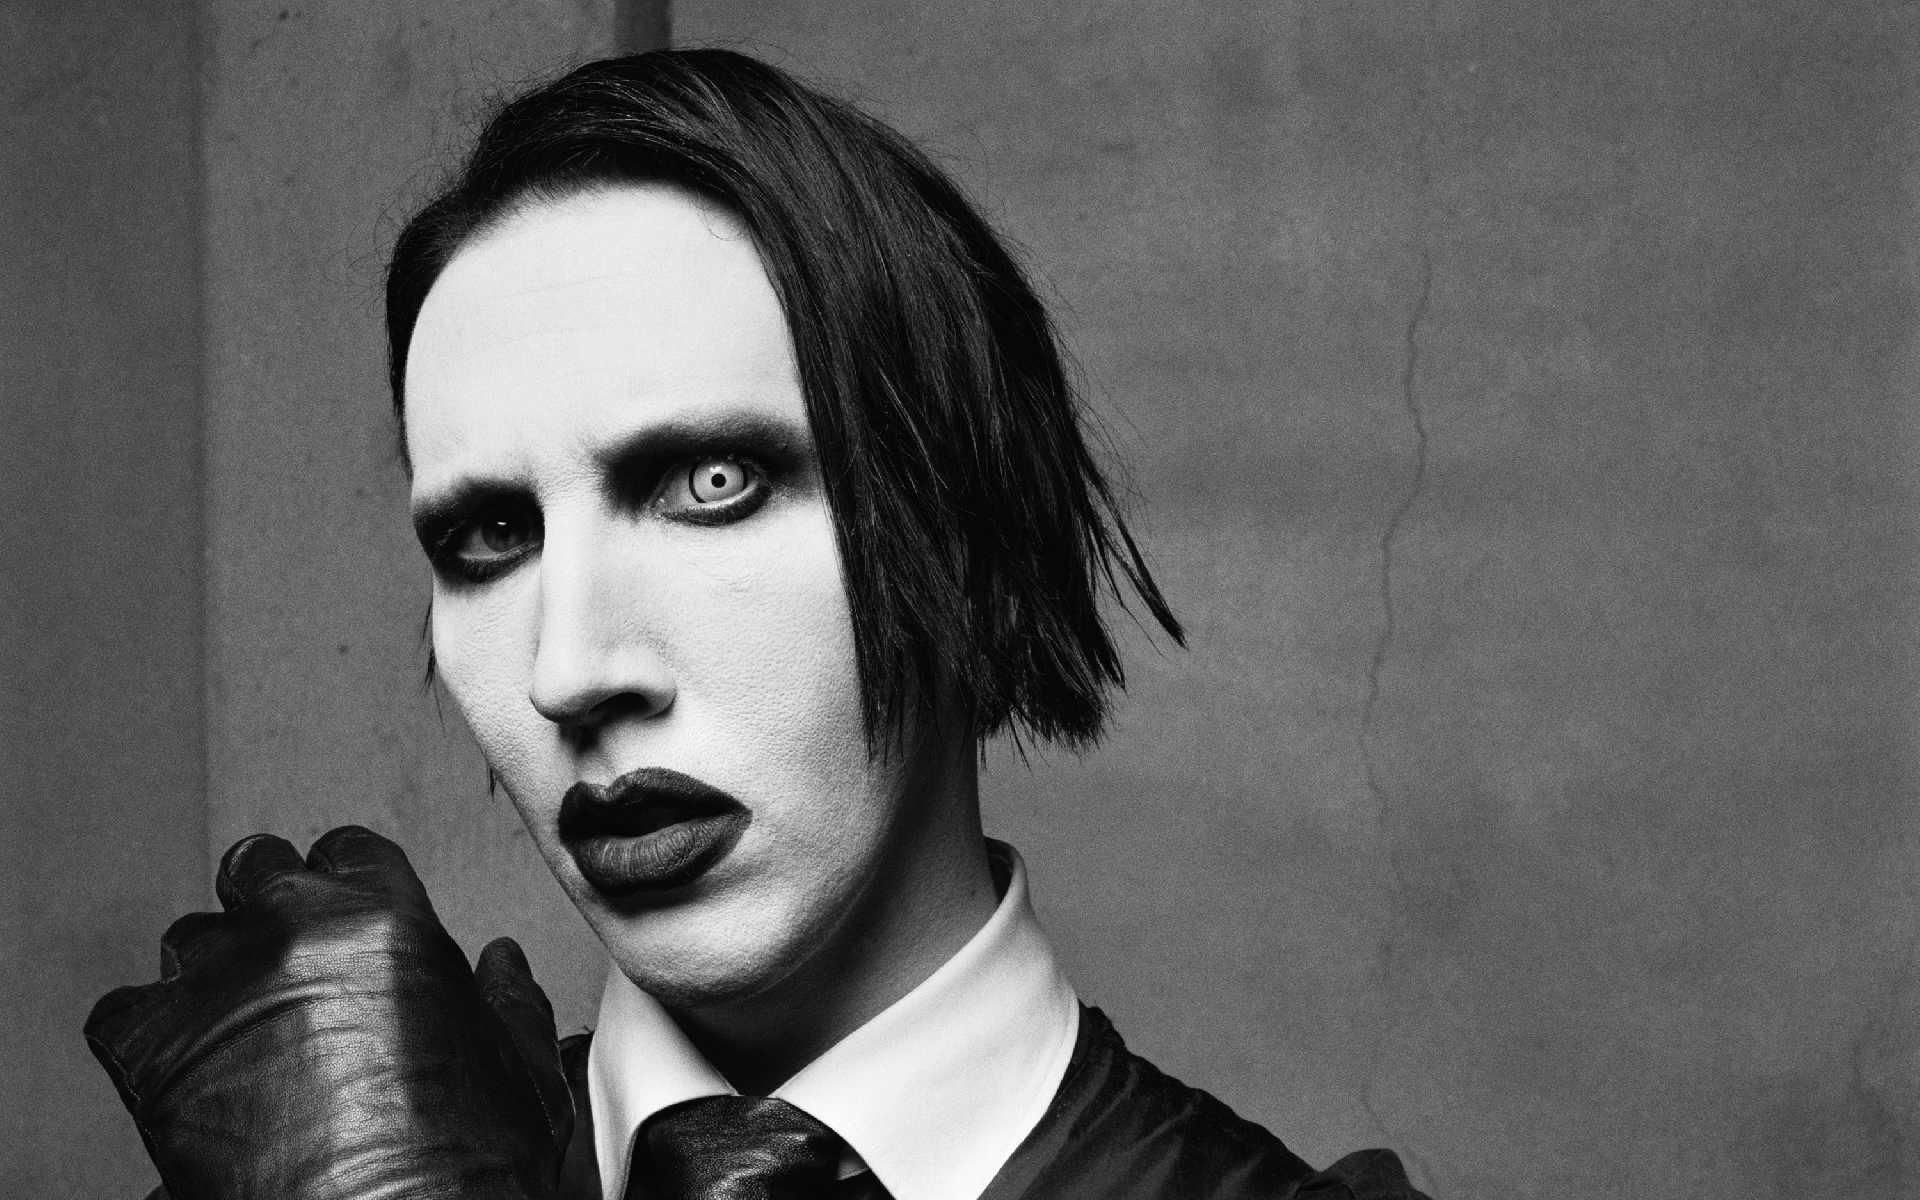 Marilyn Manson - 1920x1200